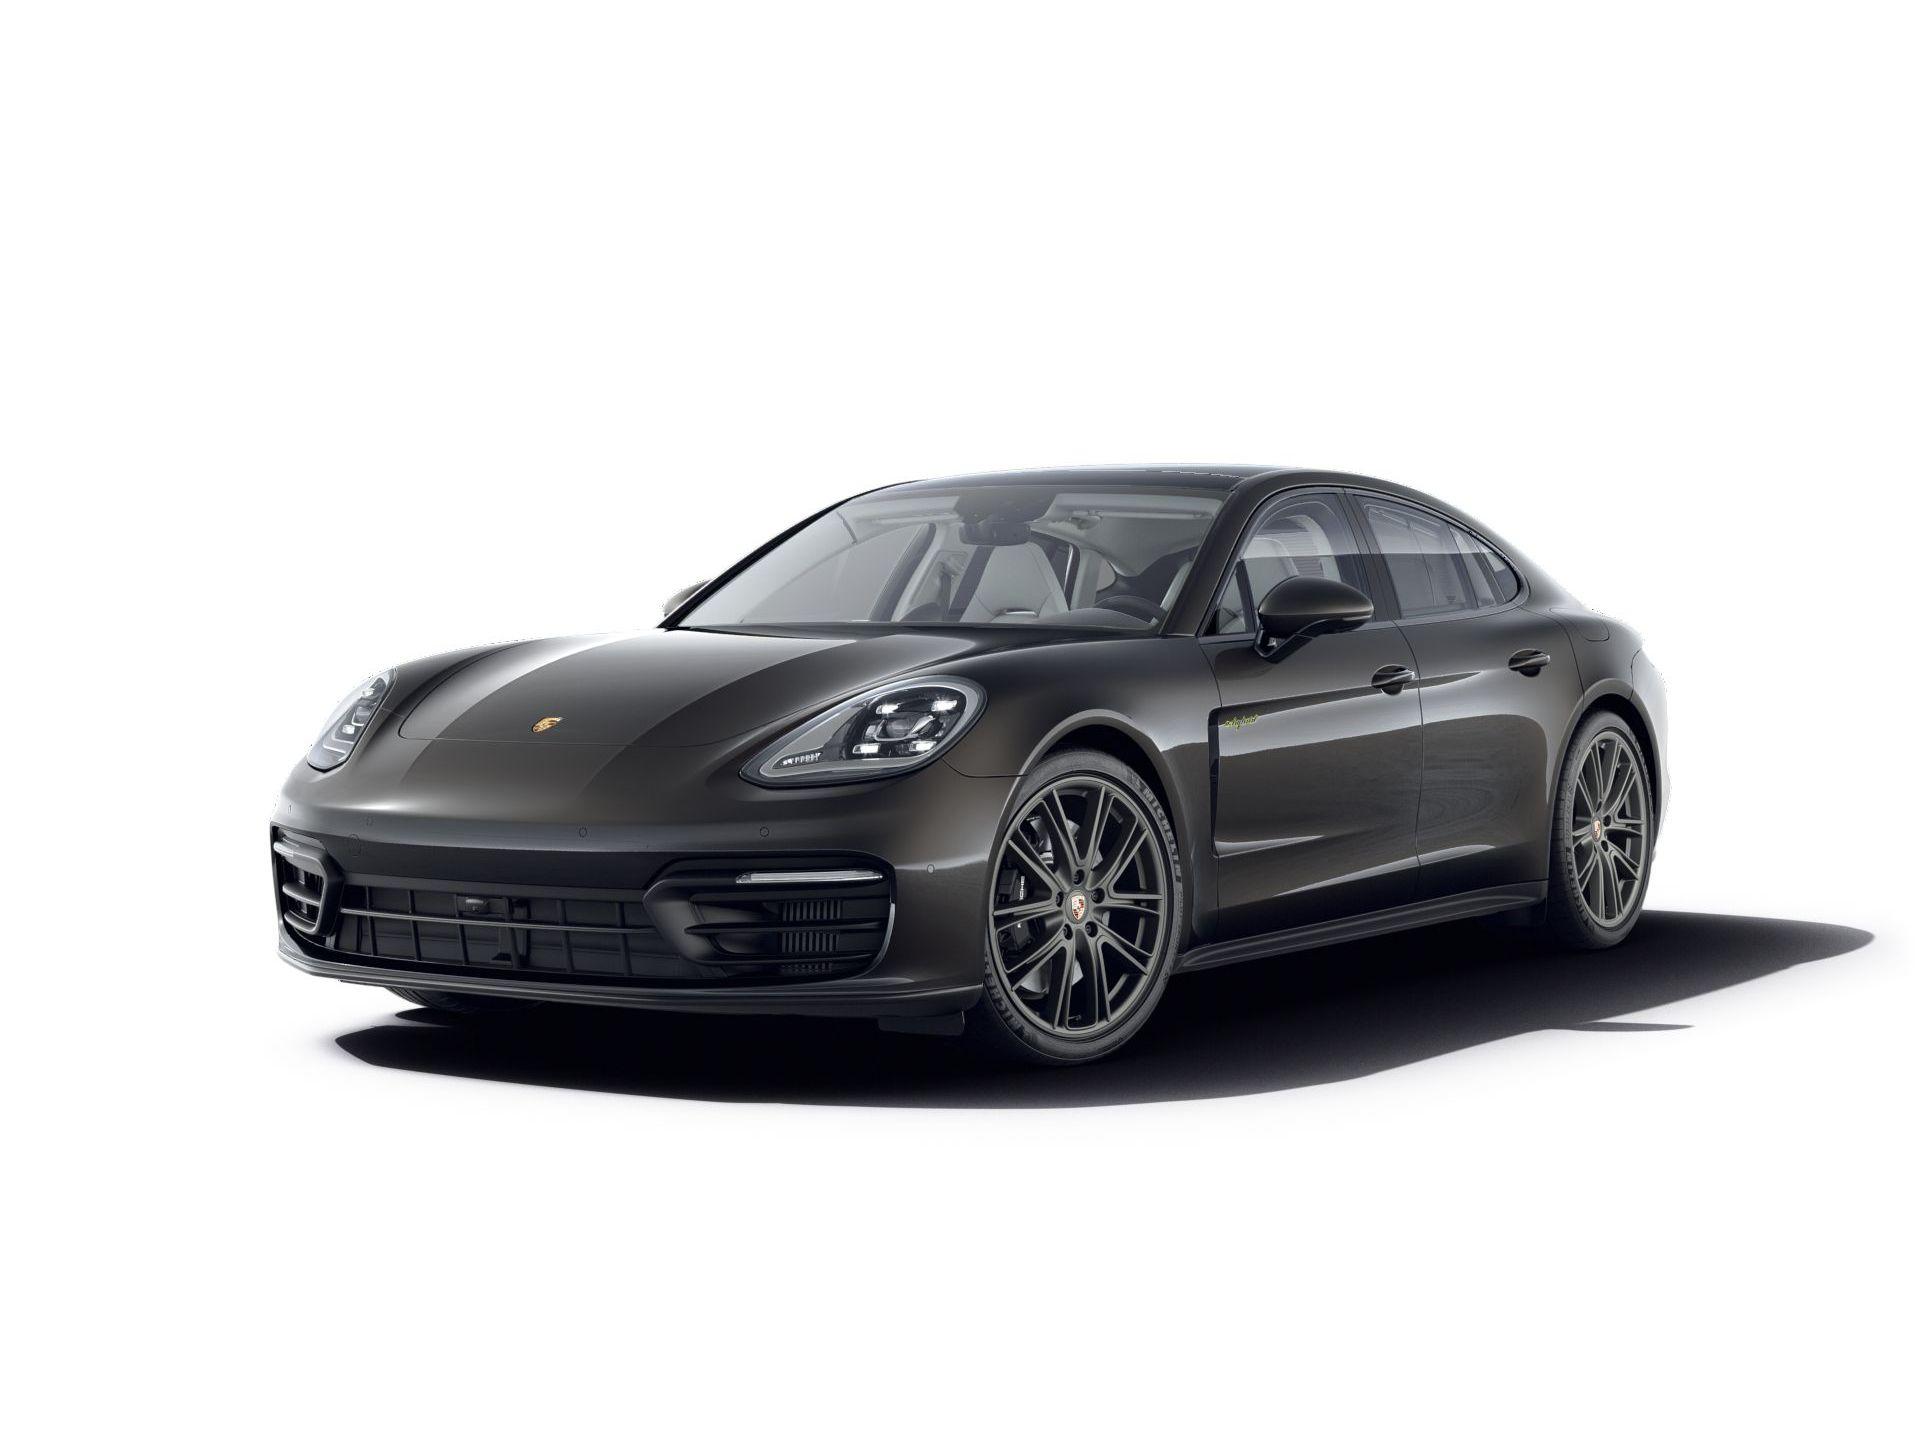 2022 Porsche Panamera 4 E-Hybrid – 1